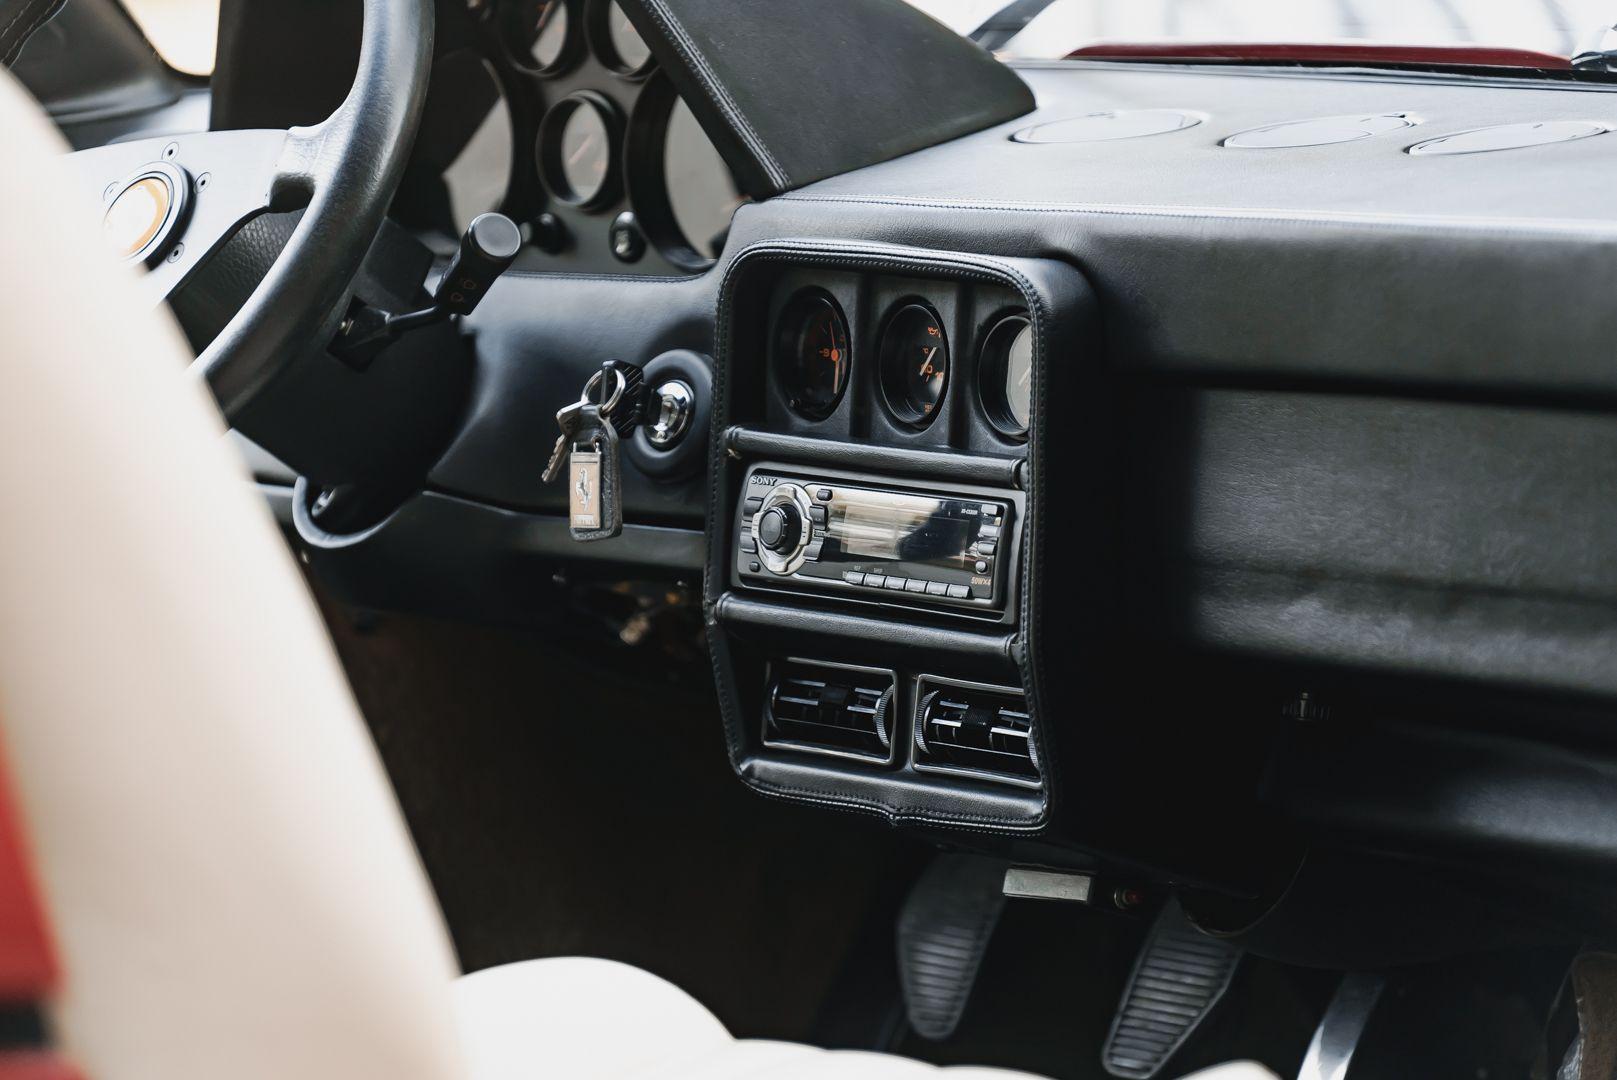 1988 FERRARI 208 GTS TURBO INTERCOOLER 75410